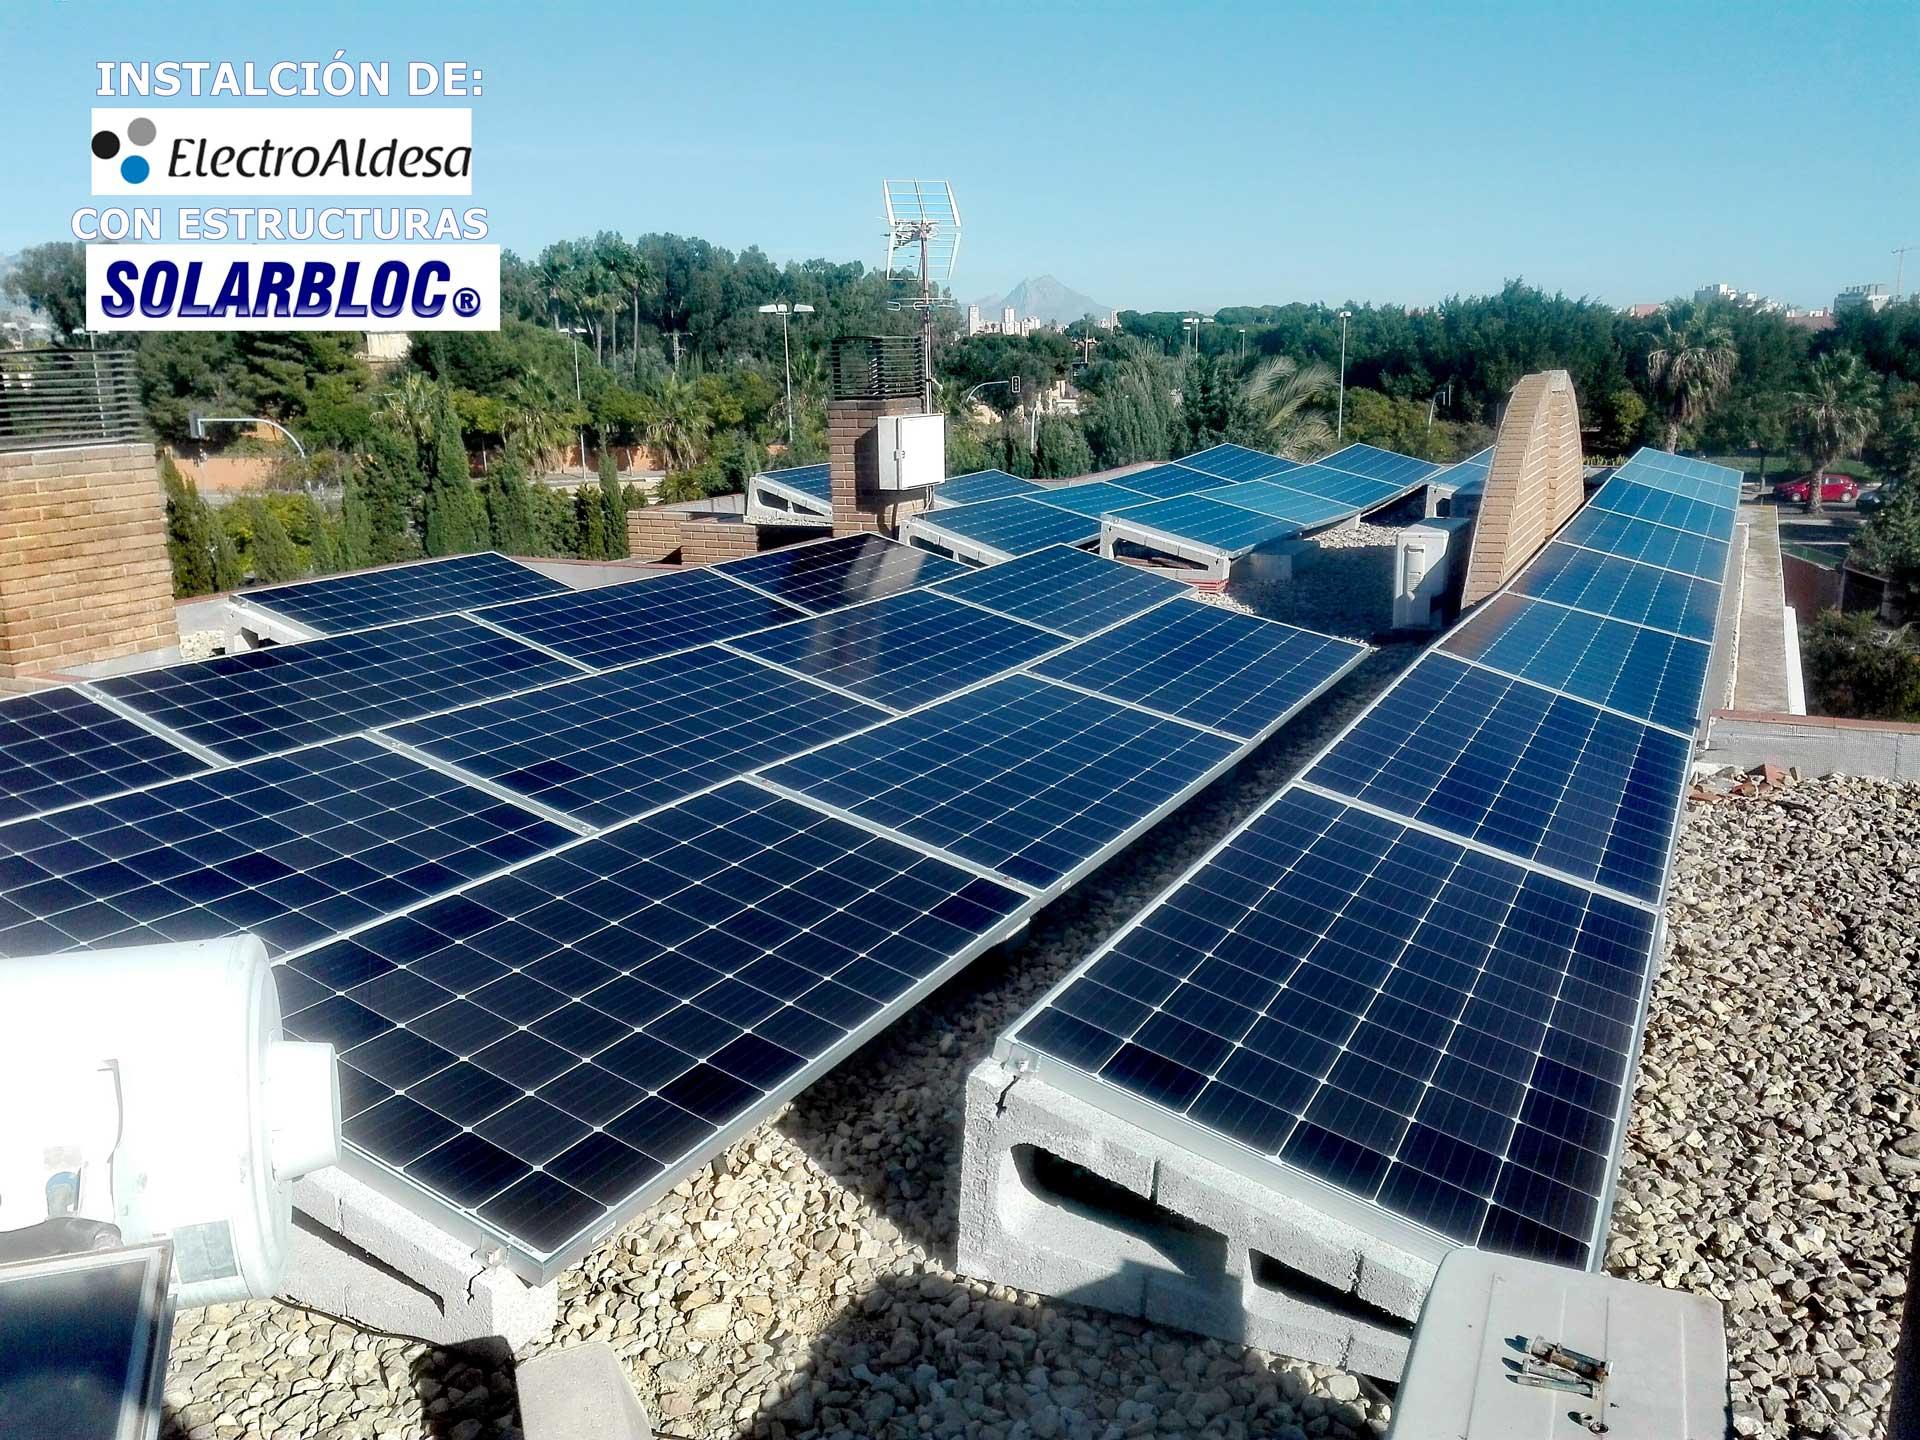 Soporte hormigón panel solar ElectroAldesa AOLARBLOC